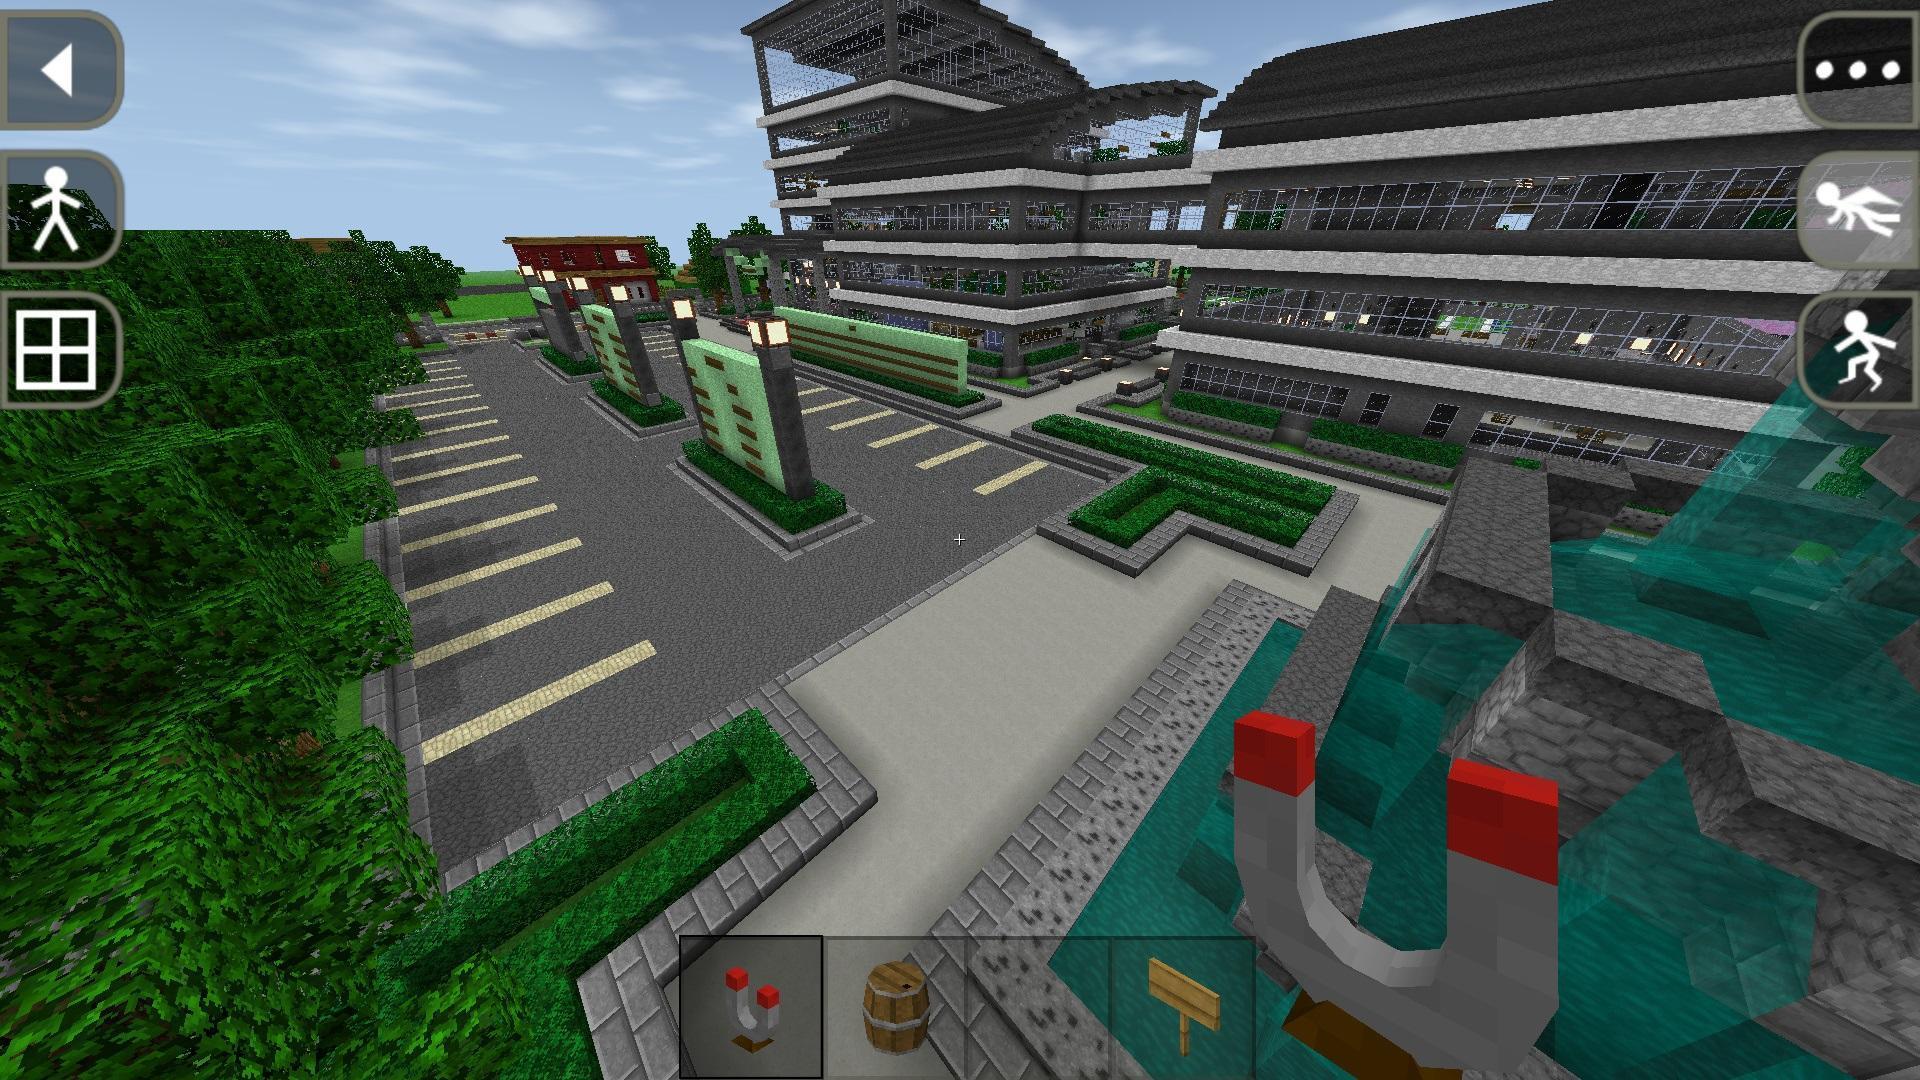 Survivalcraft Demo 1.29.54.0 Screenshot 14